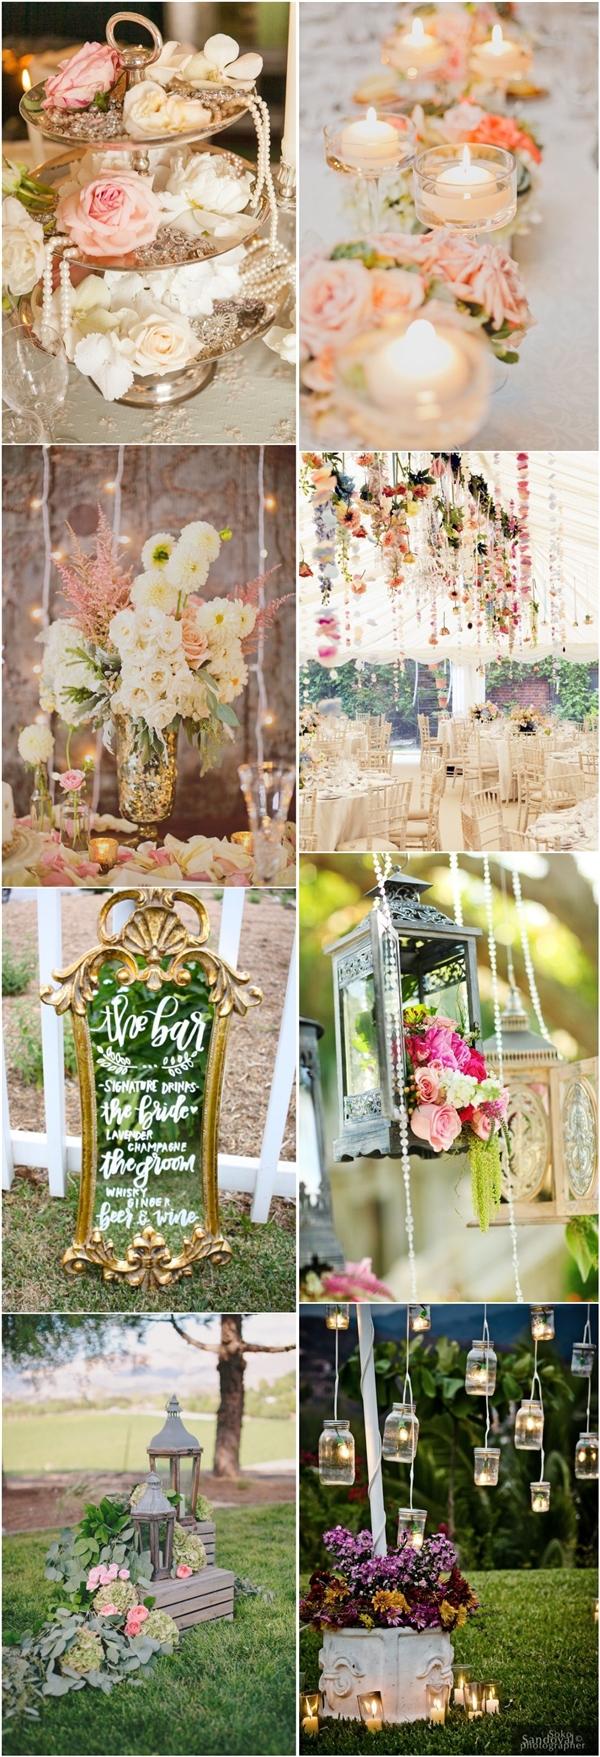 36 shabby chic vintage wedding ideas vintage wedding ideas rustic chic vinatge wedding decor ideas